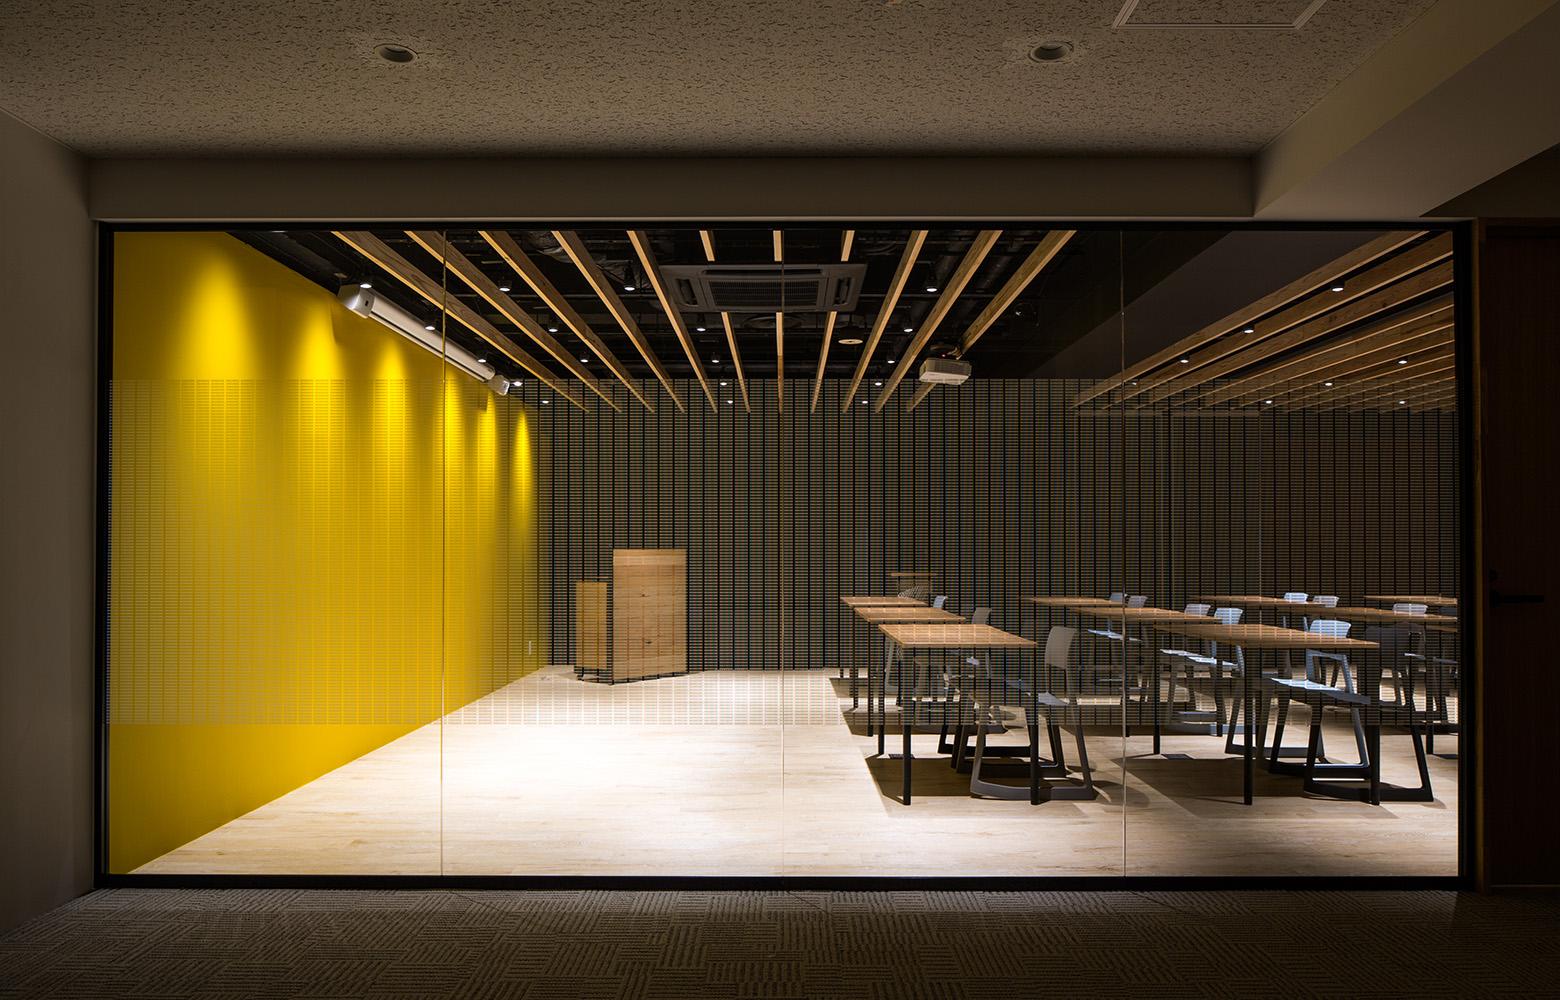 Secret Office Theater Room_2 デザイン・レイアウト事例